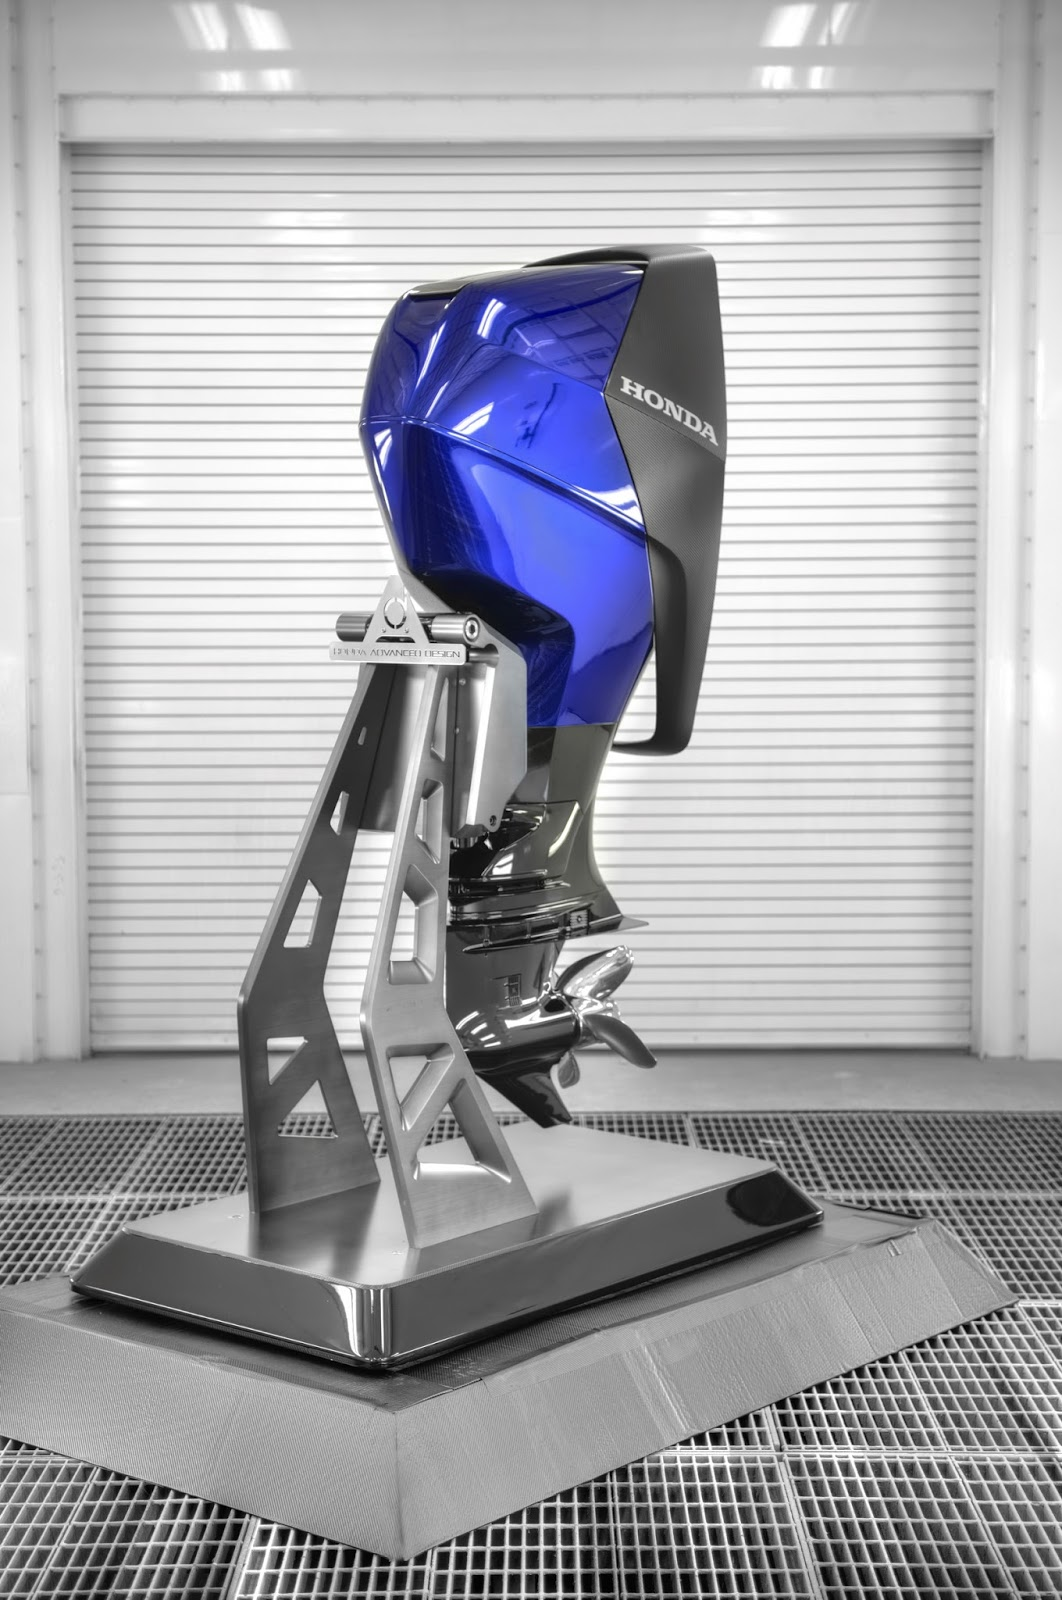 Honda Created An NSX-Inspired Outboard Marine Engine